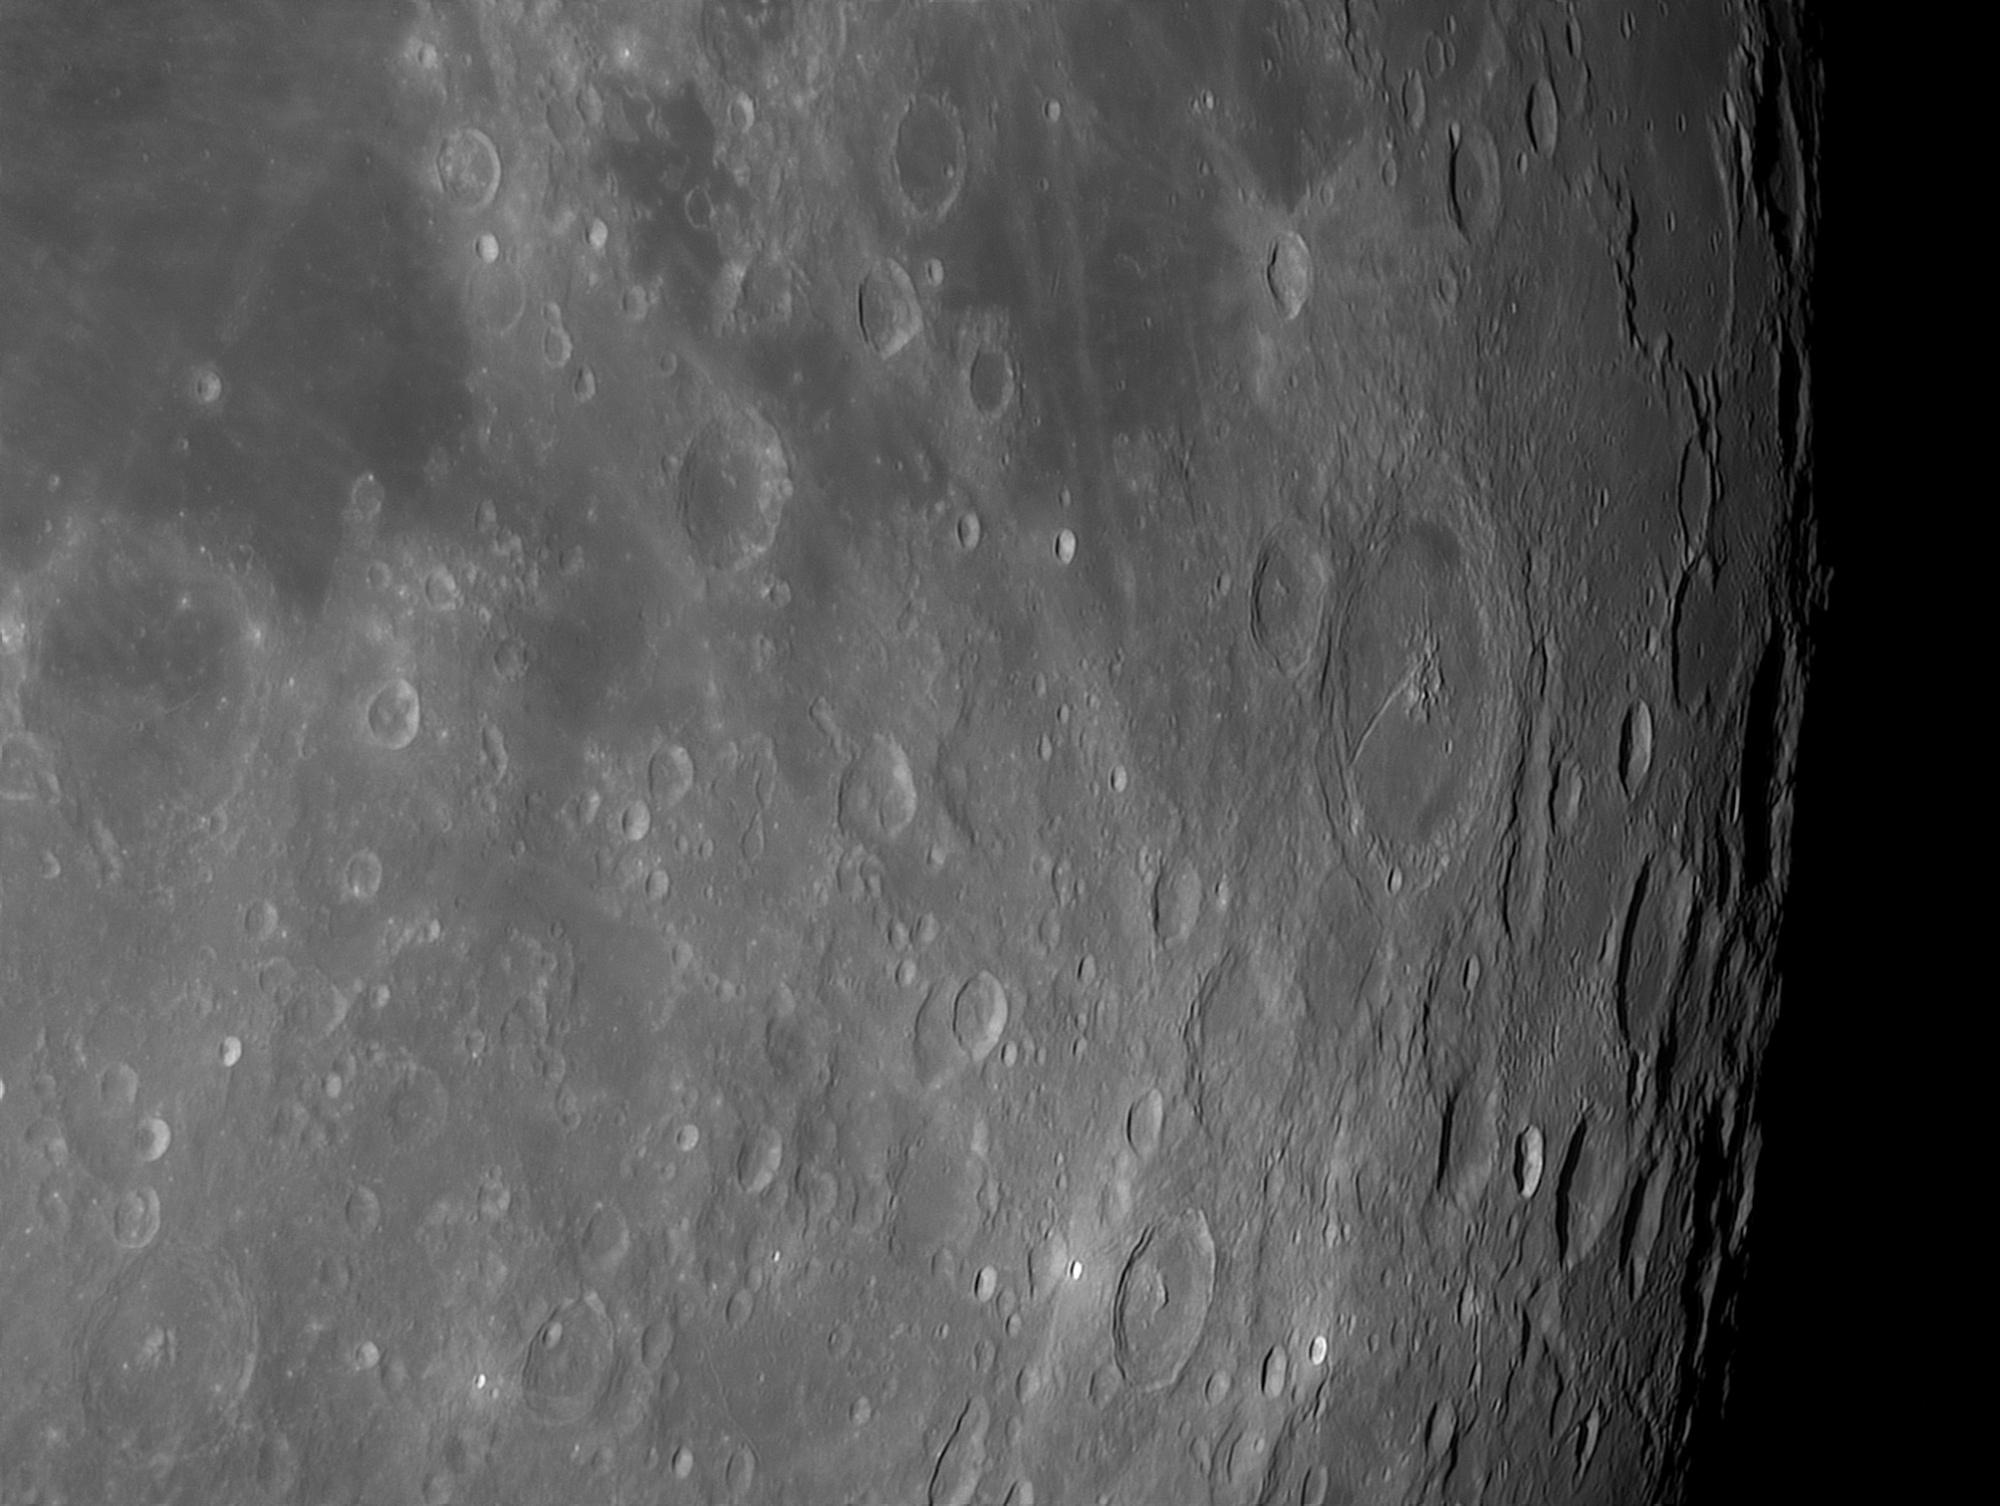 Petavius-20210228baPSAS.thumb.jpg.df31a06a57d5eb323fa5a93fa2d2ac92.jpg